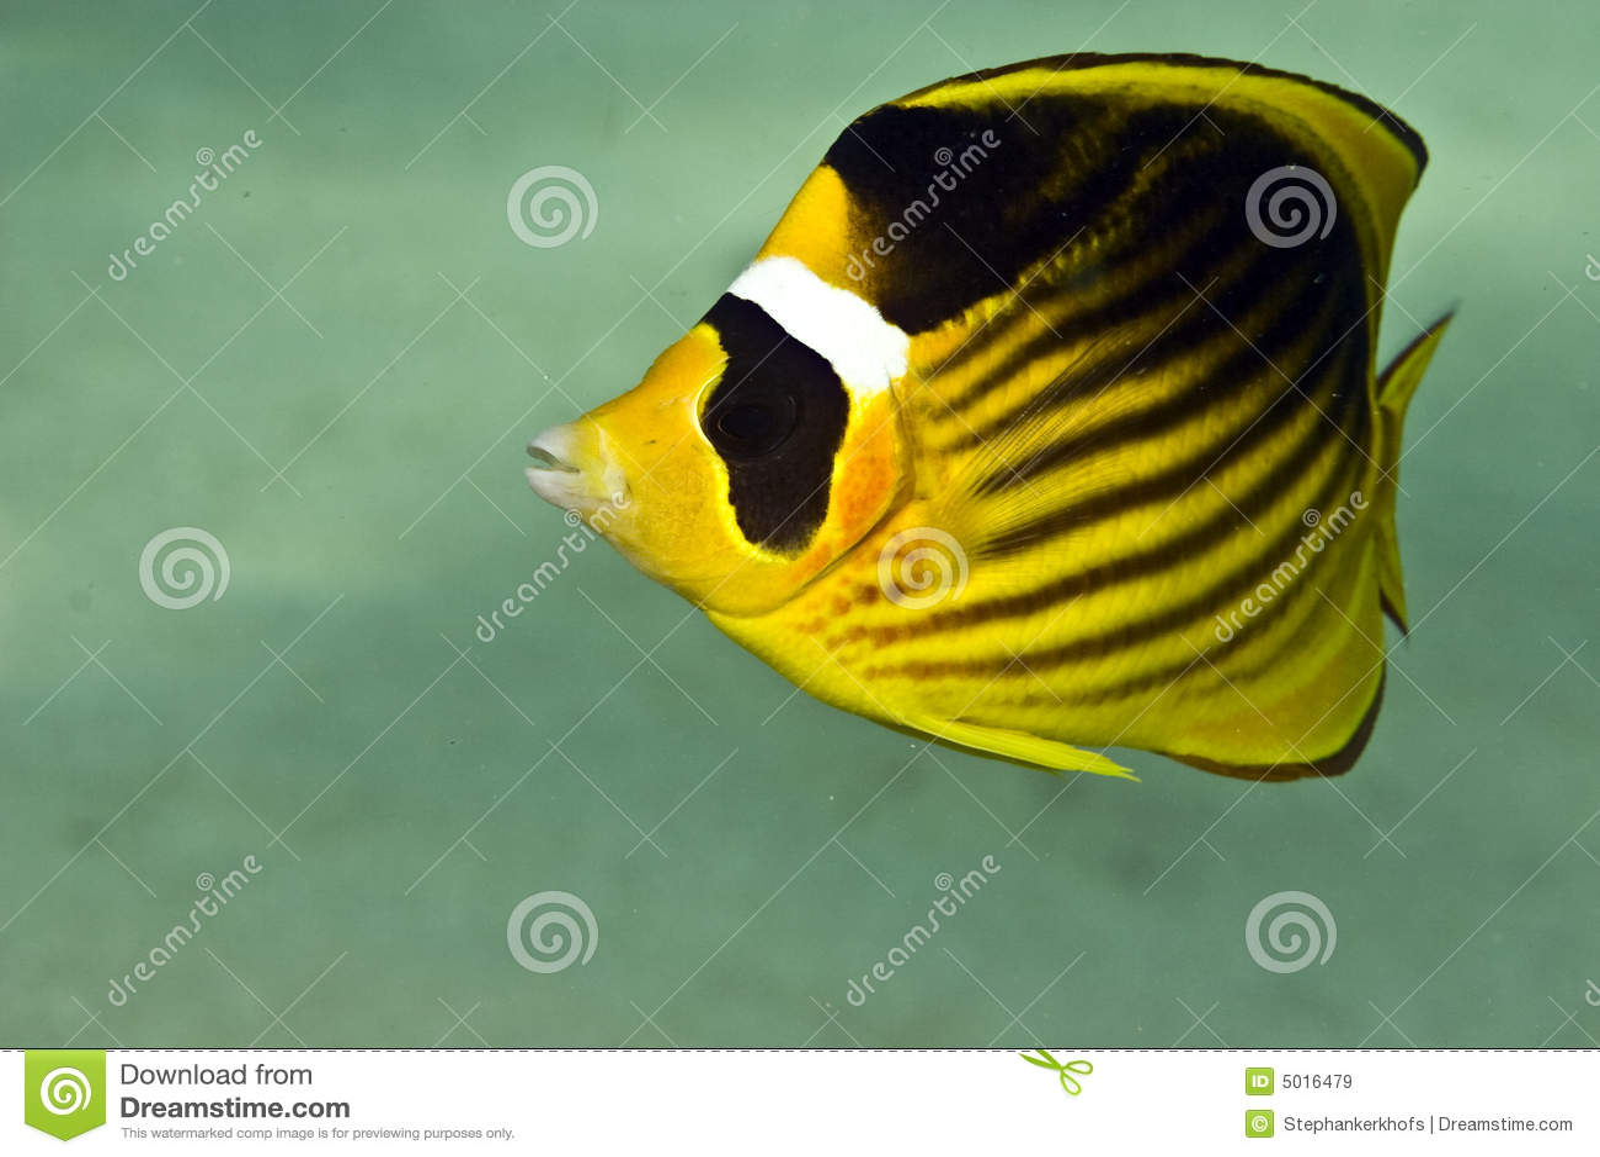 Red sea raccoon butterflyfish (chaetodon fasciatus